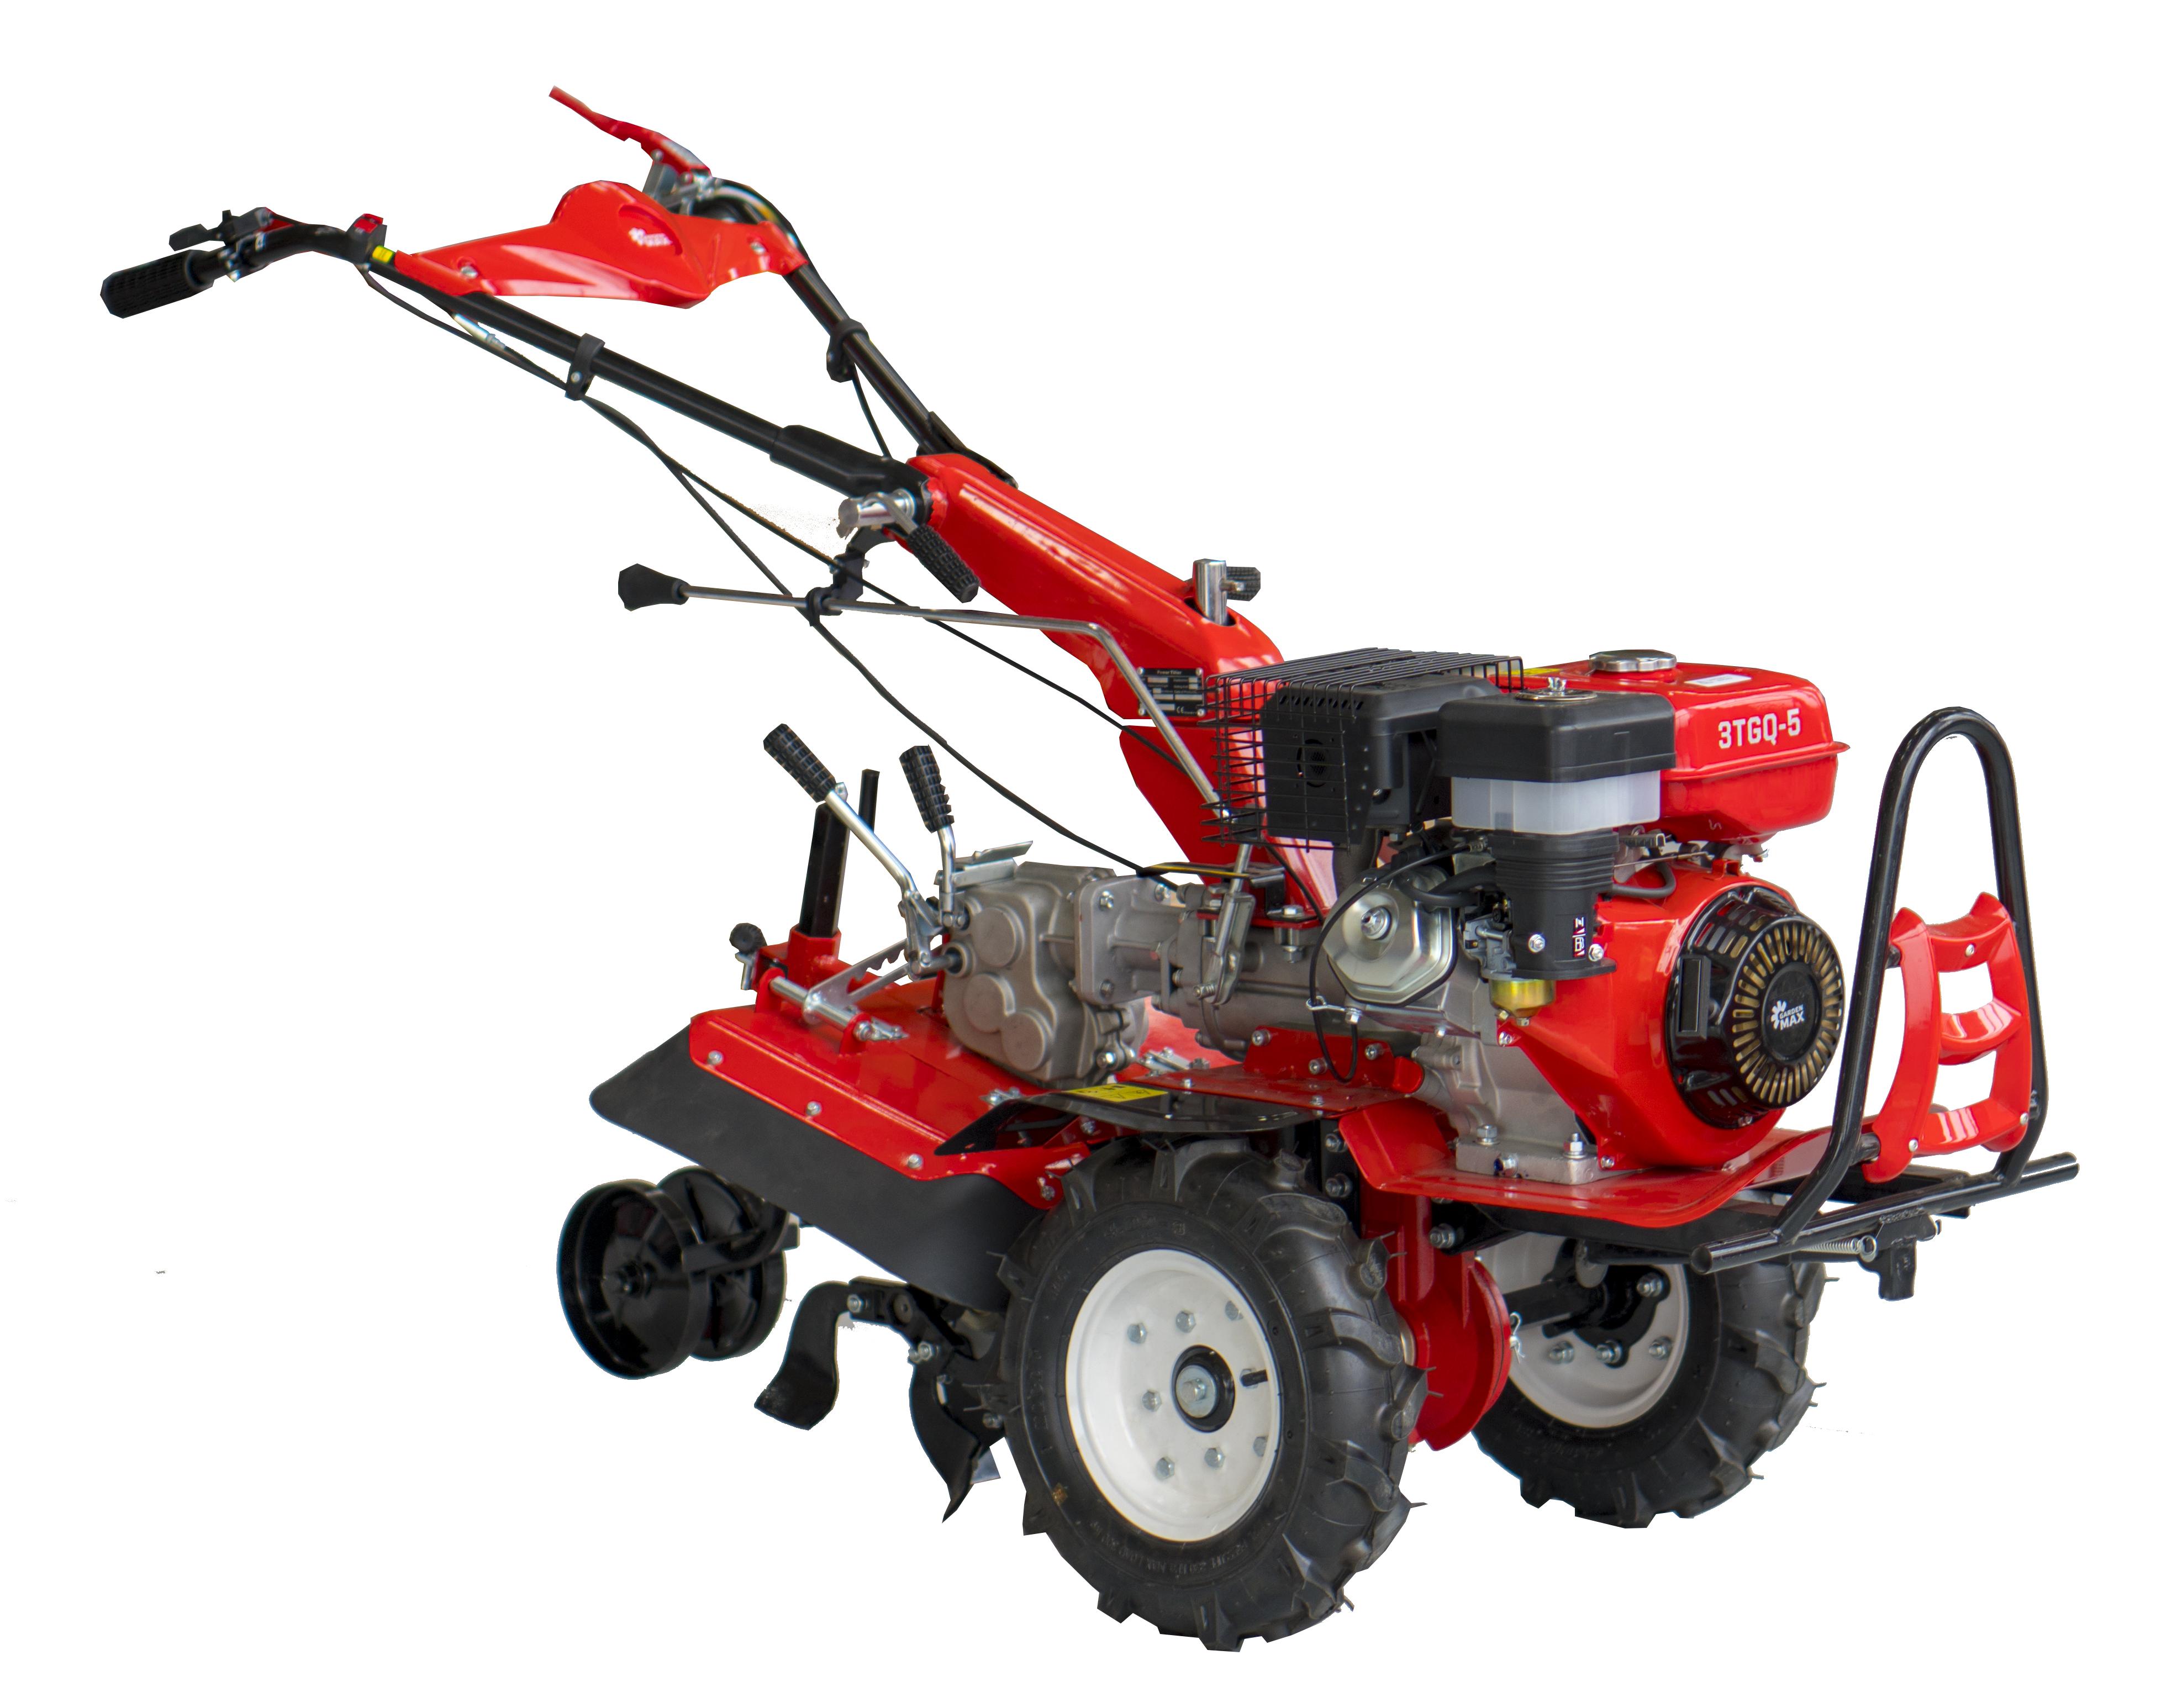 Мотоблок GardenMAX 3TGQ-5 + допълнителен инвентар